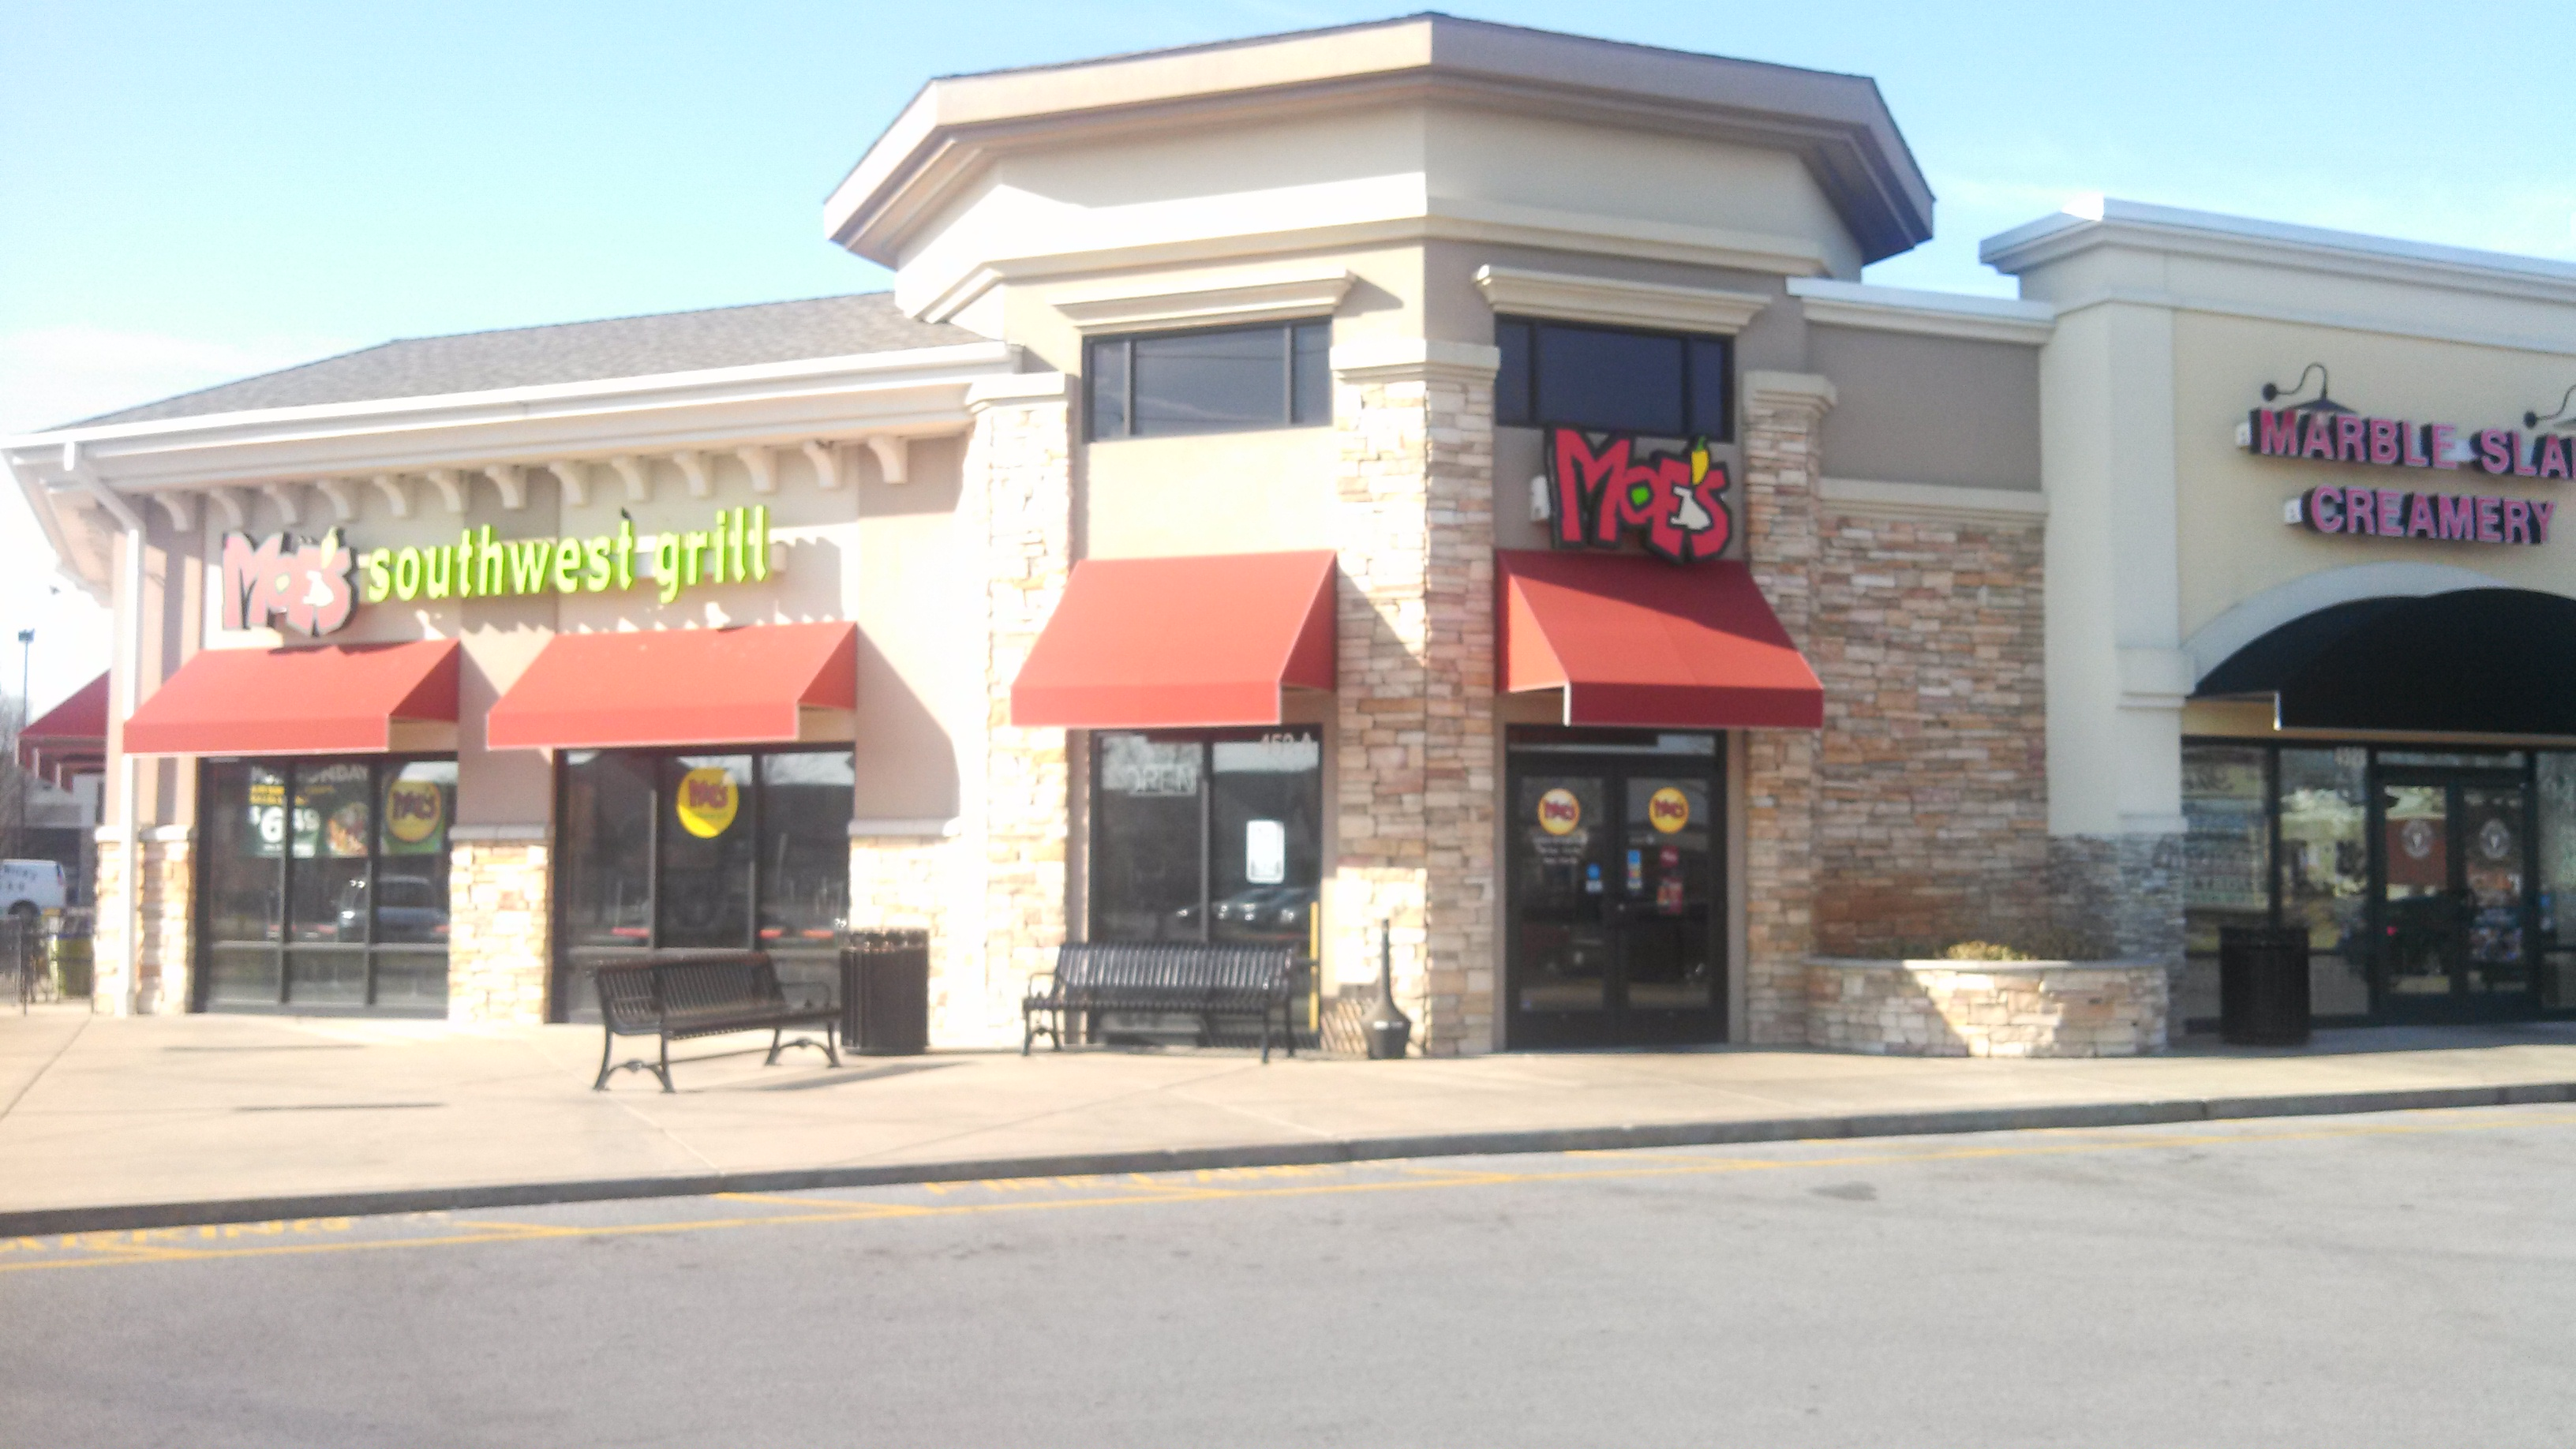 Moe's Southwest Grill in Murfreesboro, TN